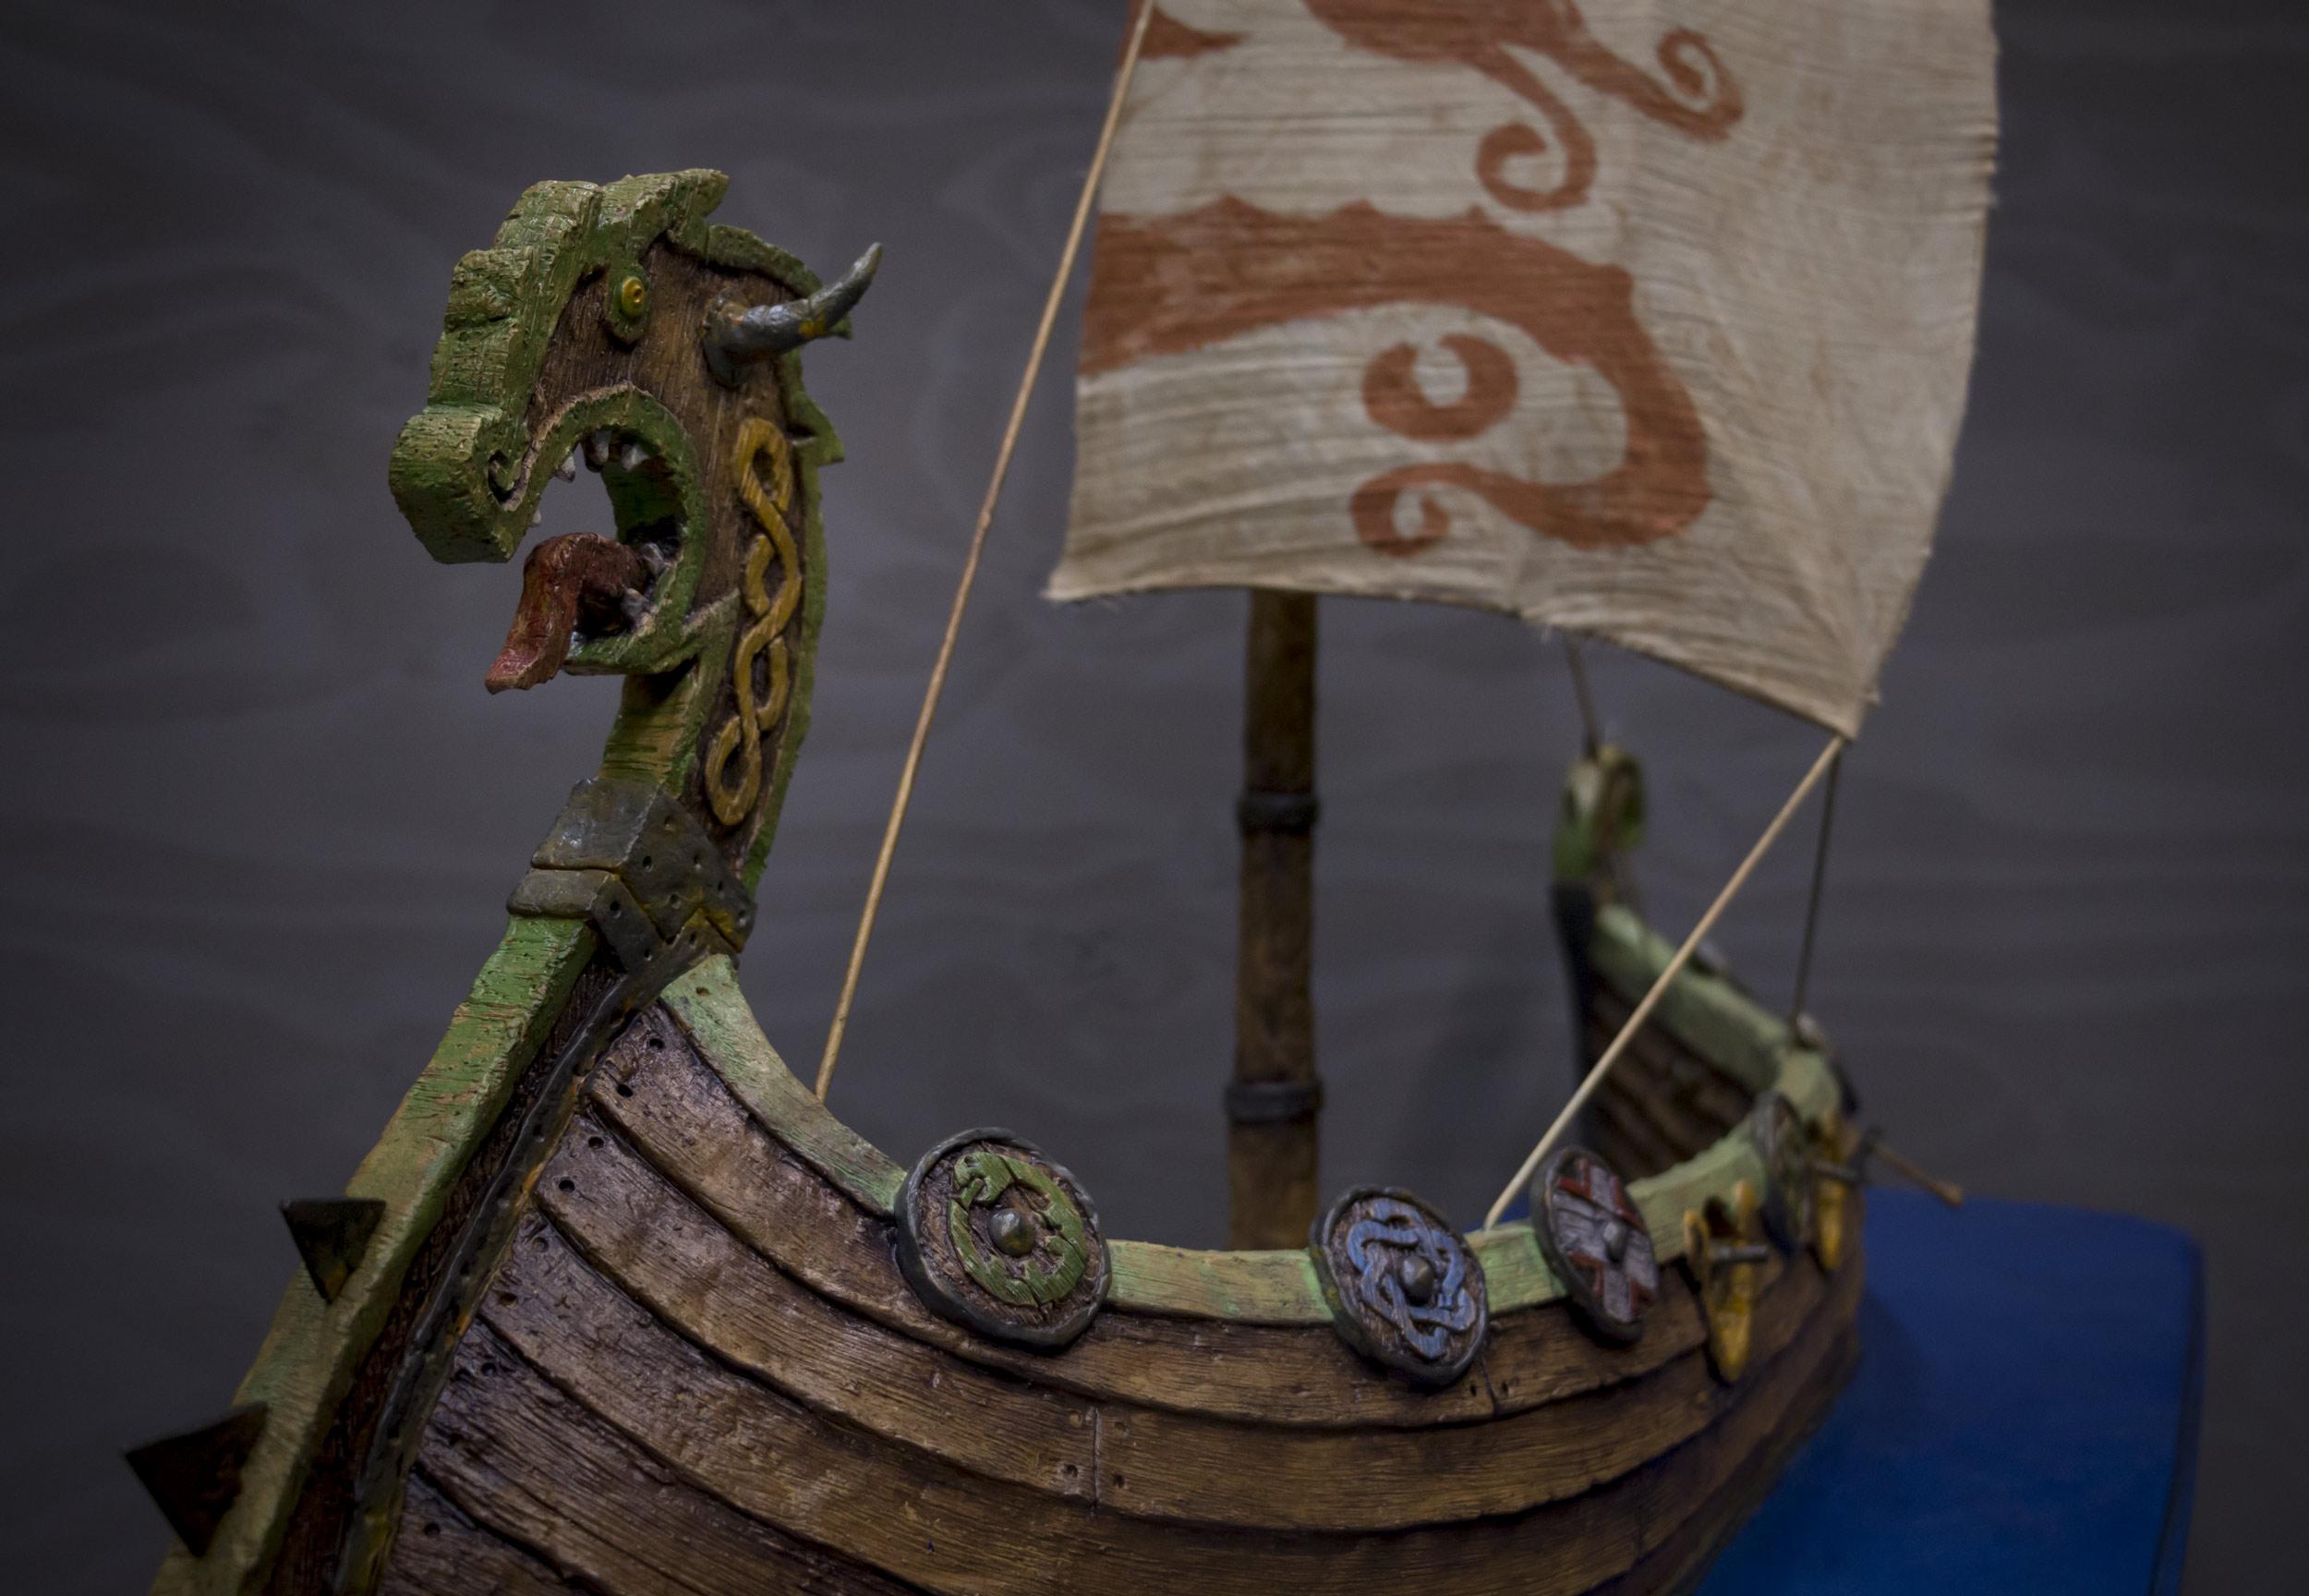 viking-ship-model-8.jpg